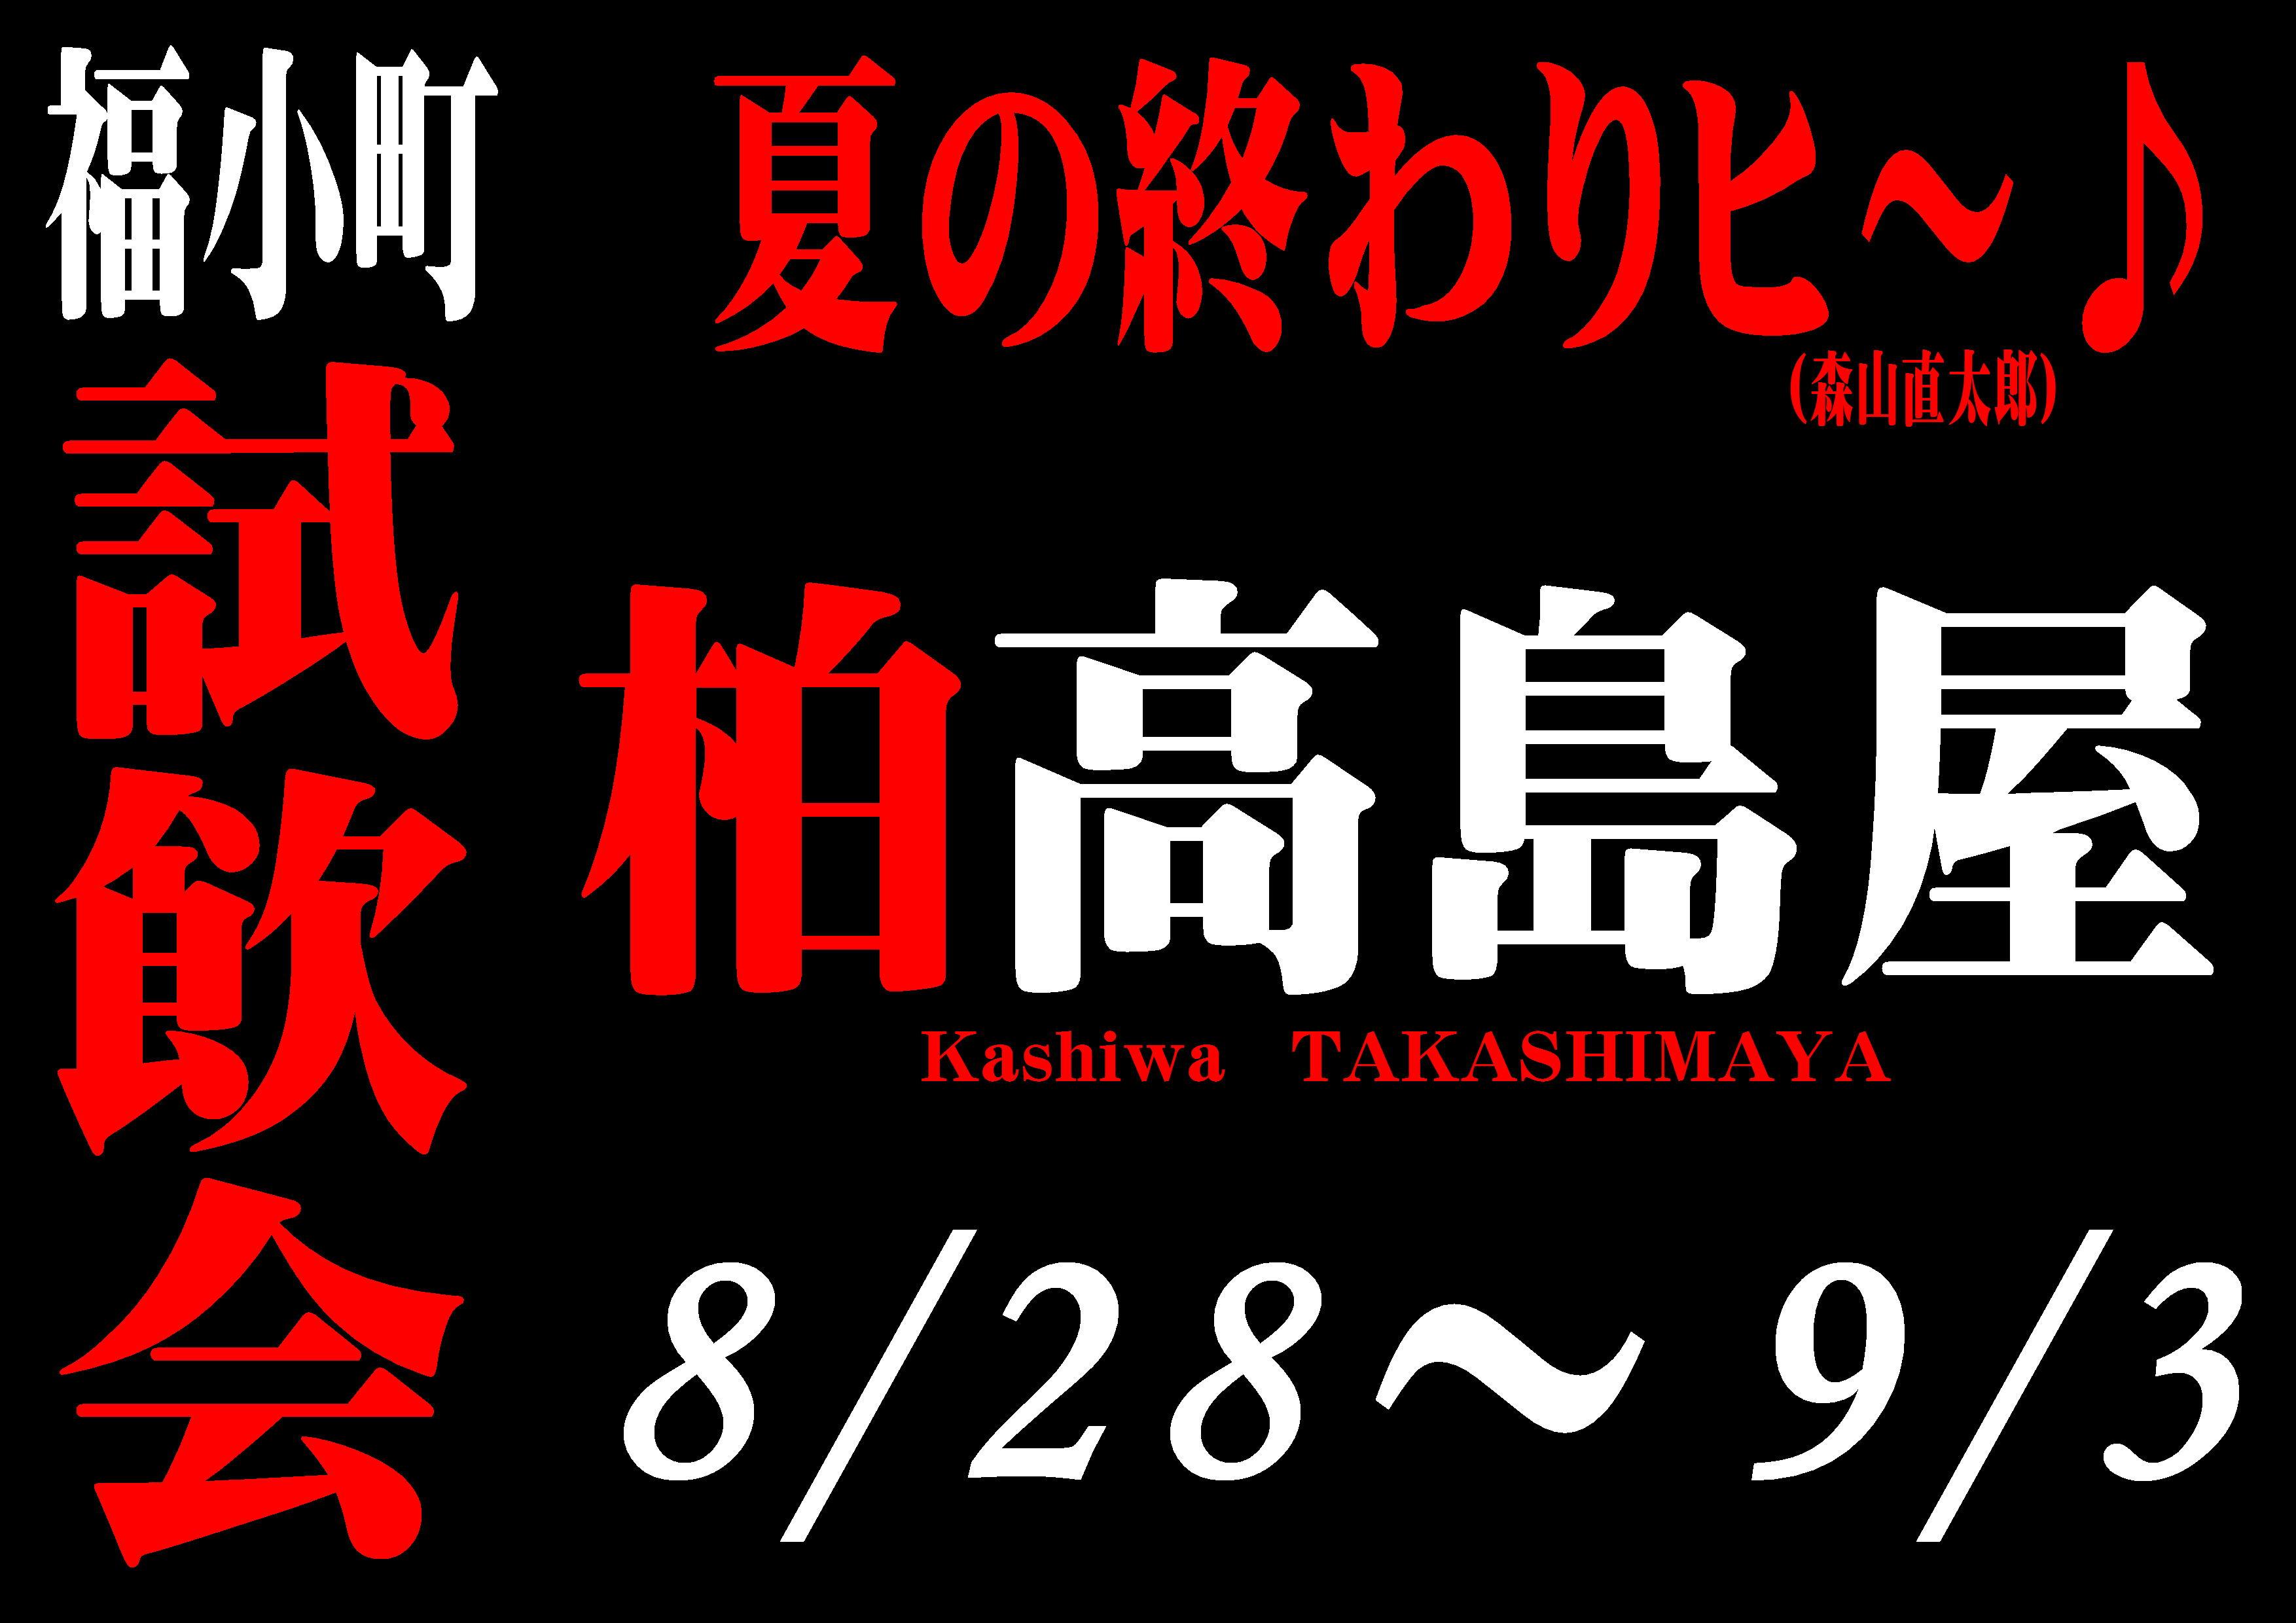 http://www.fukukomachi.com/blog/photo/20190828.JPG